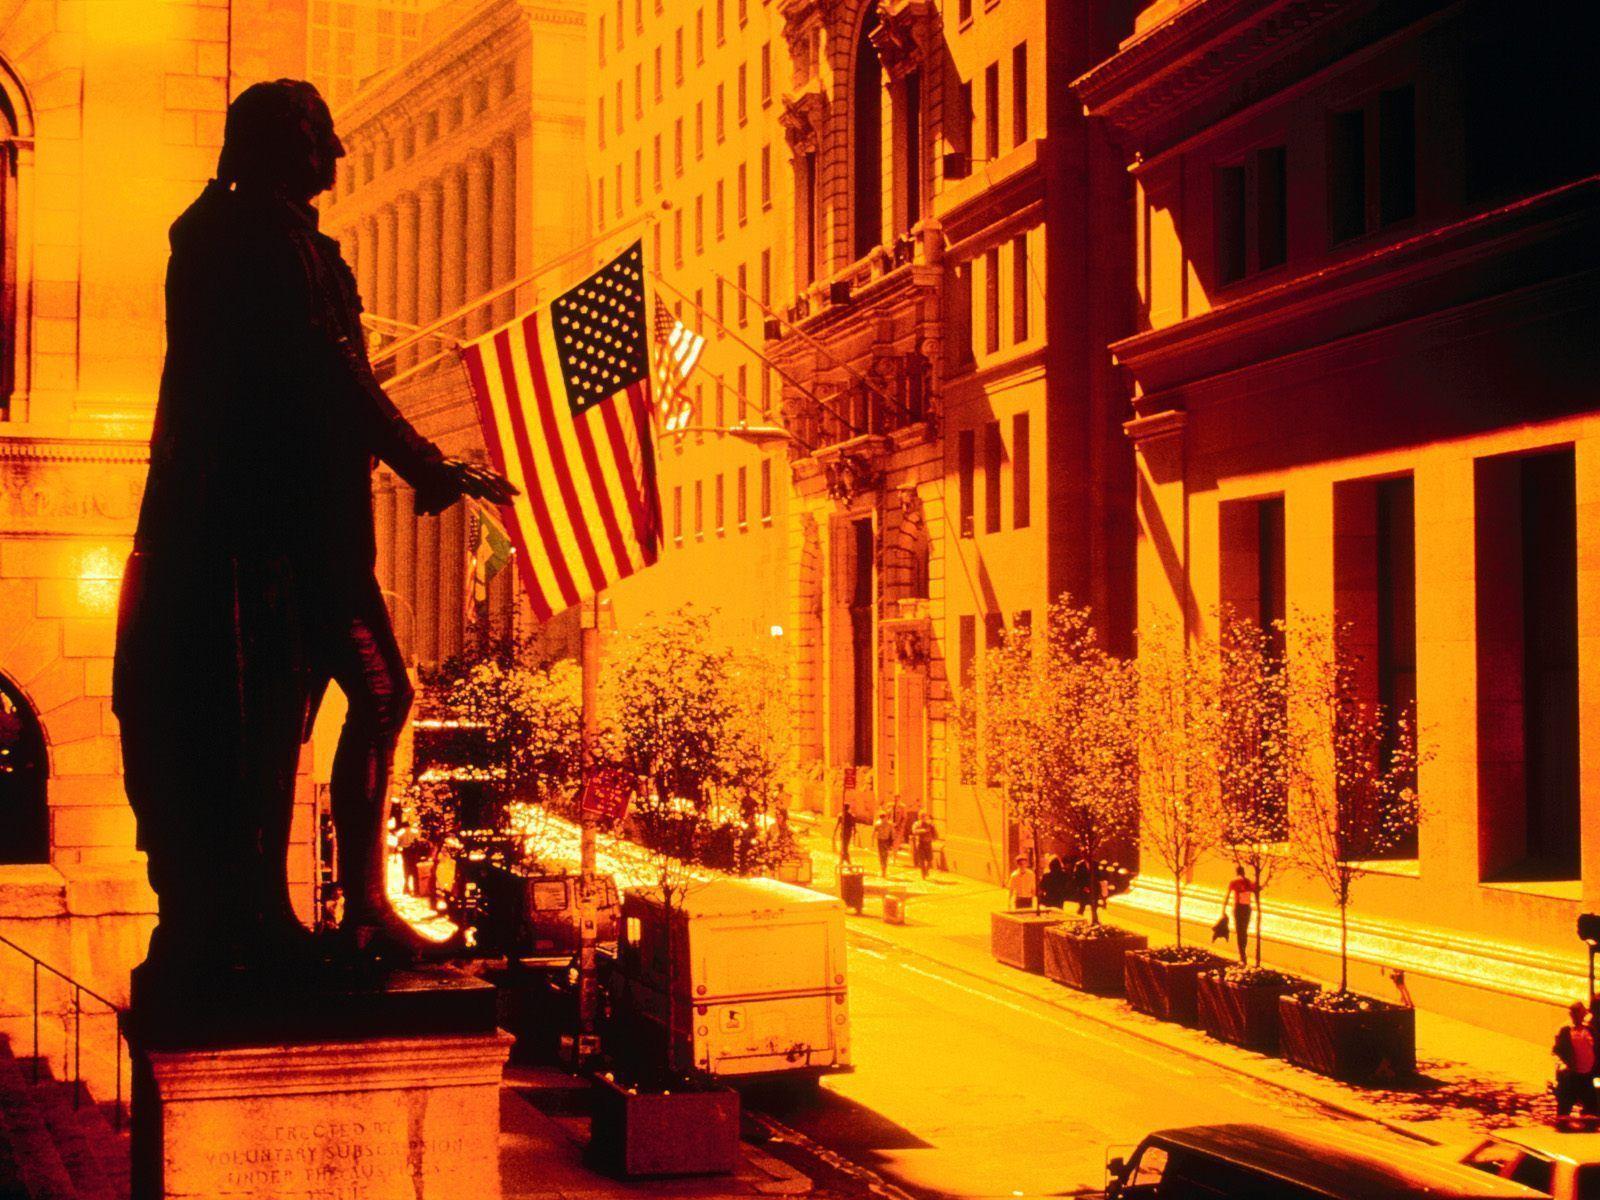 Wall Street Wallpapers - Wallpaper Cave